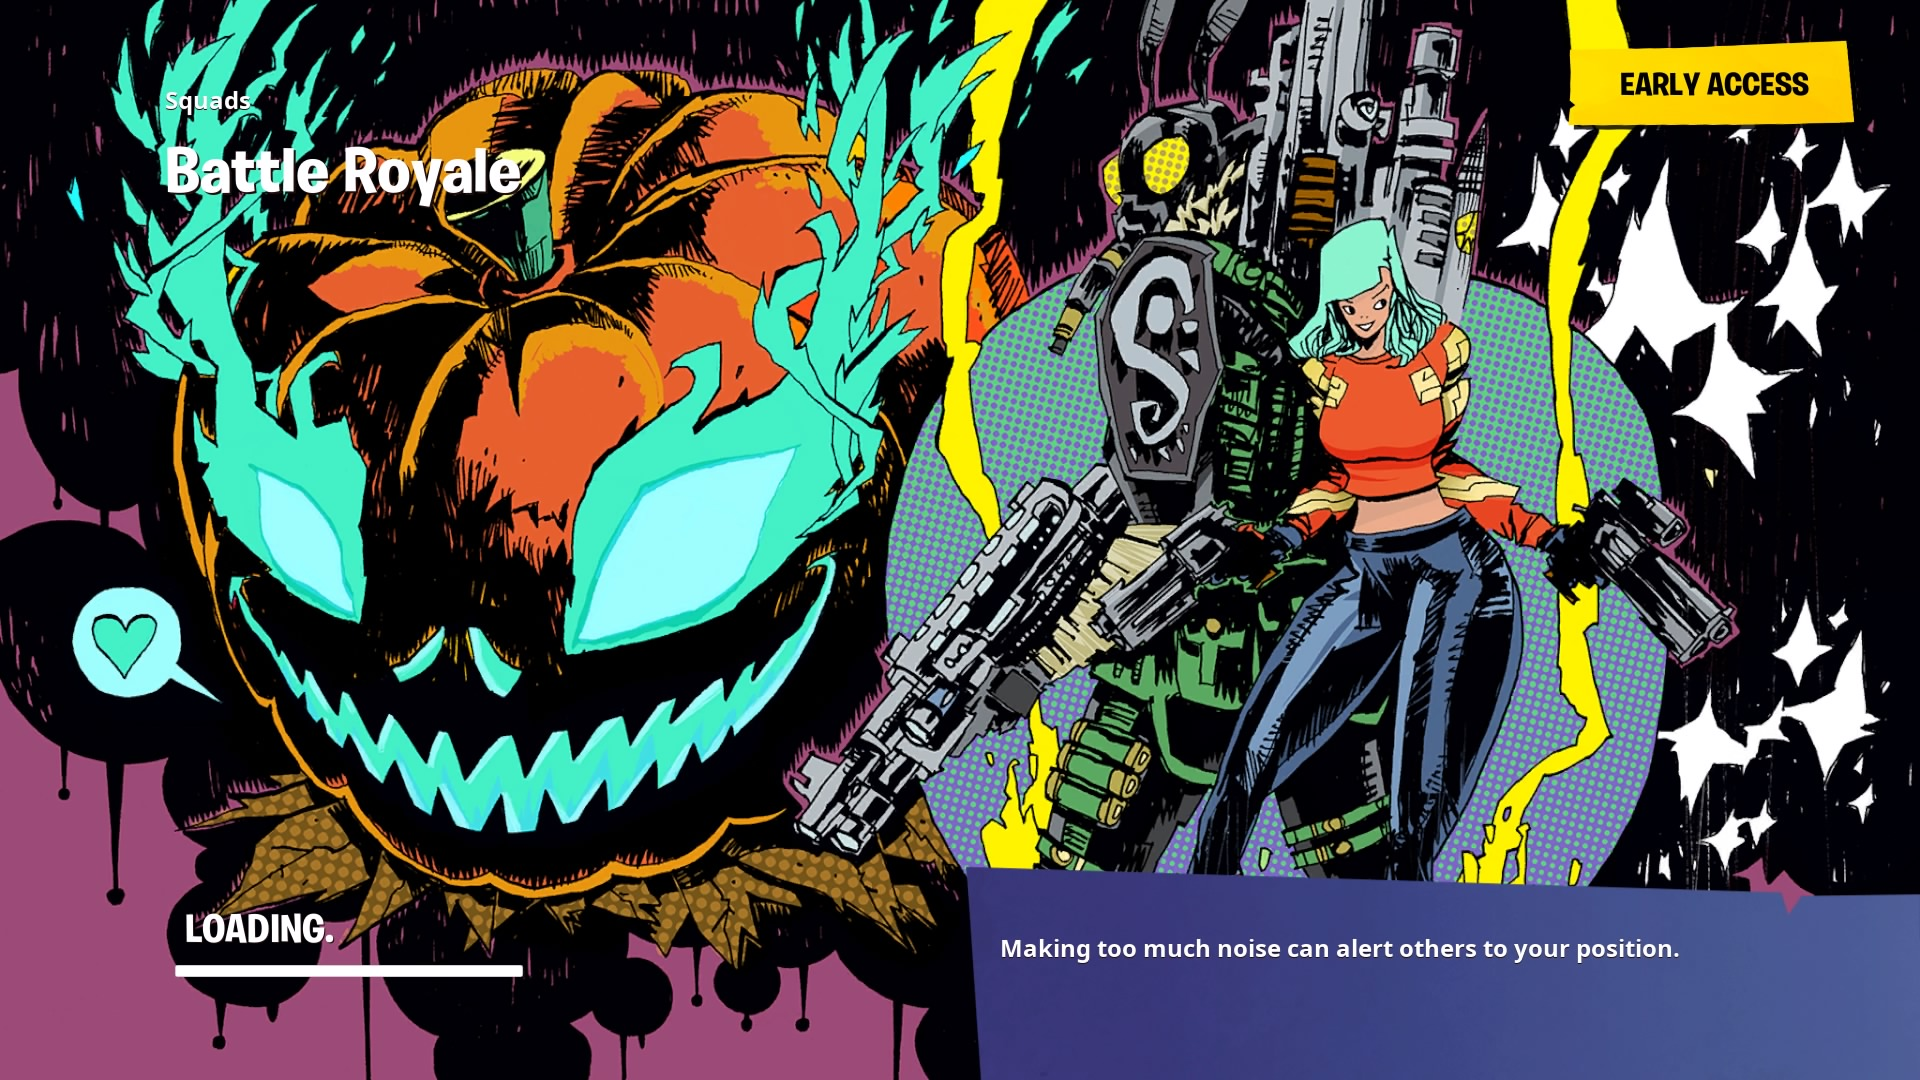 Fortnite Halloween Wallpaper 69310 1920x1080px